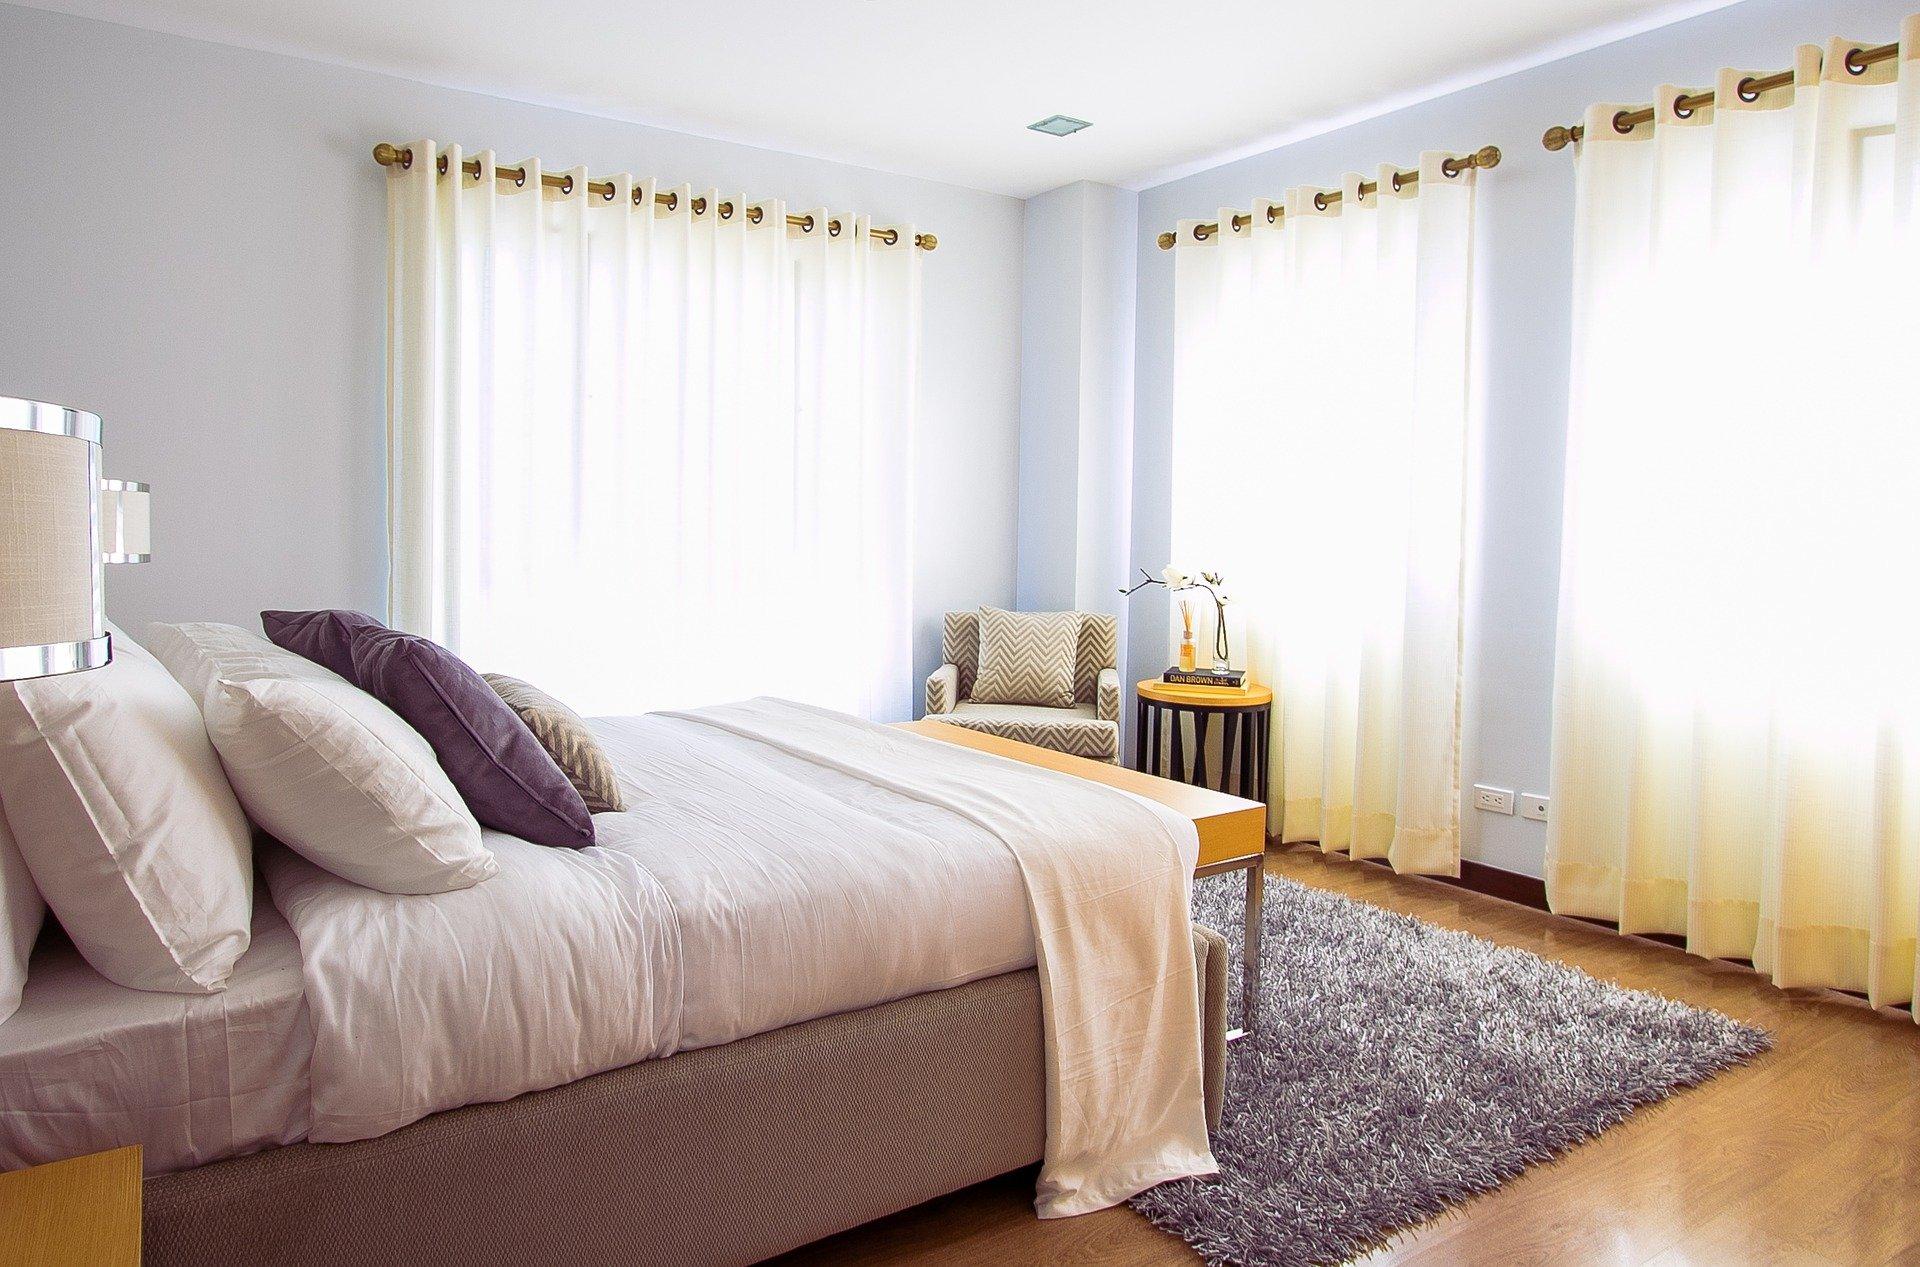 Dormitorio moderno con alfombra